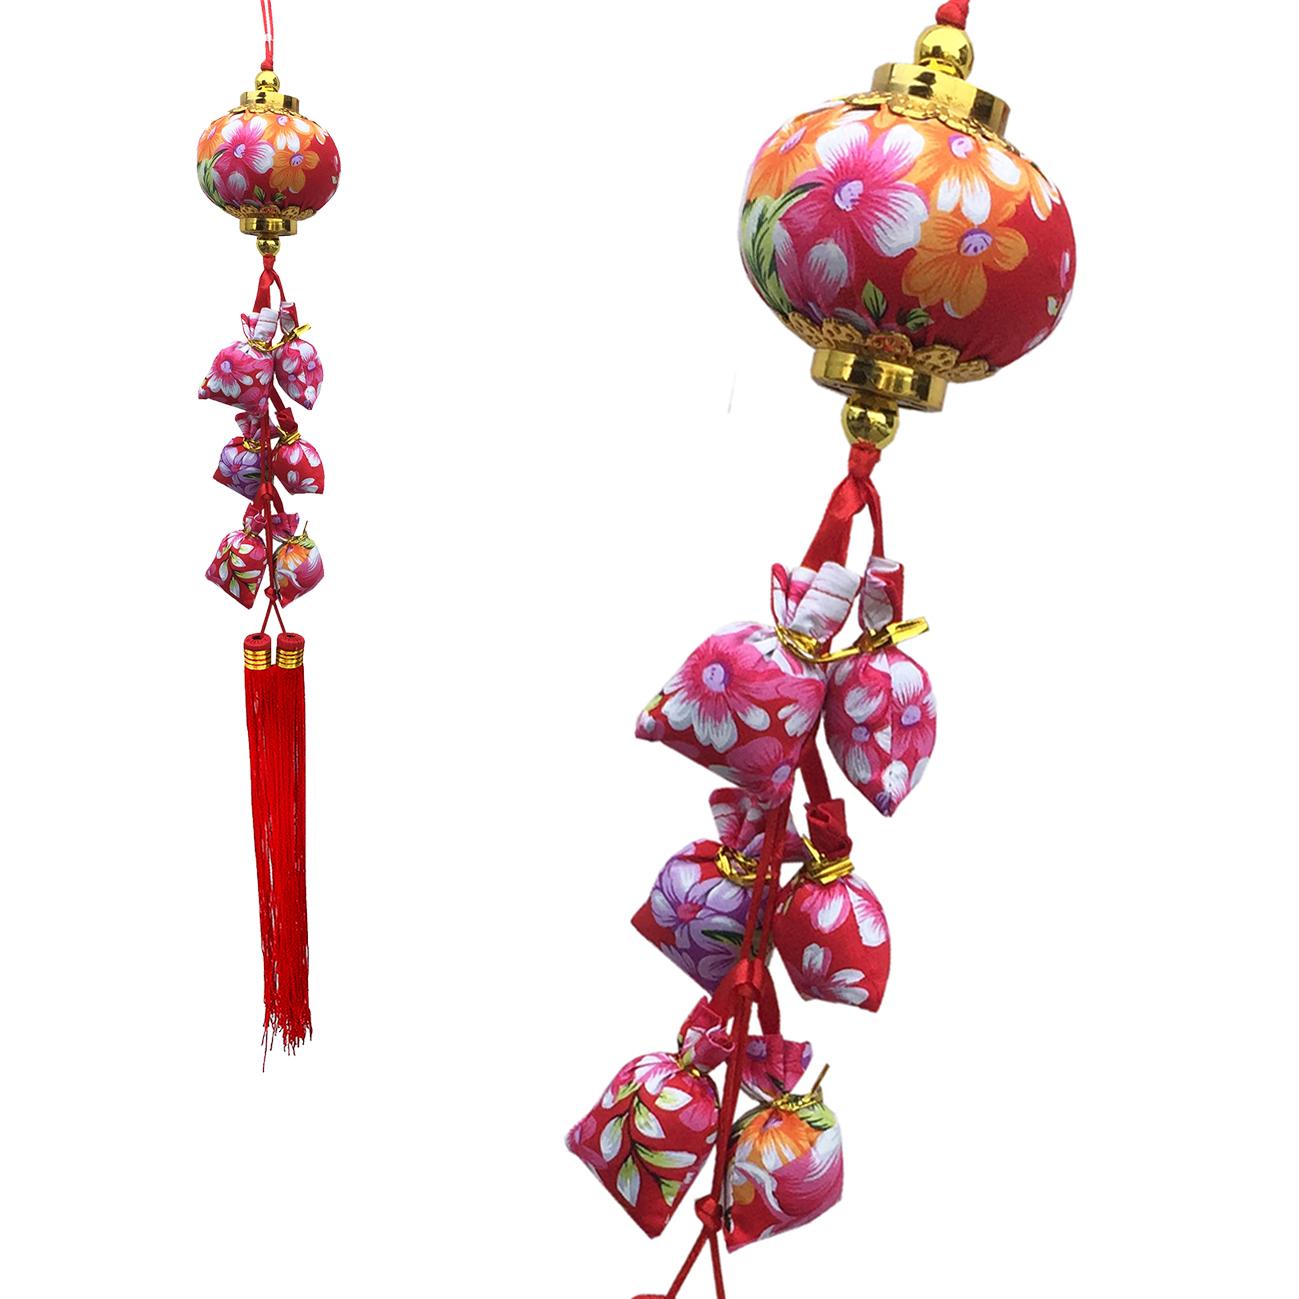 X射線【Z157134】客家風花布燈籠+錢袋,春節/過年/吊飾/過年佈置/做生意/送禮/開運/雞年